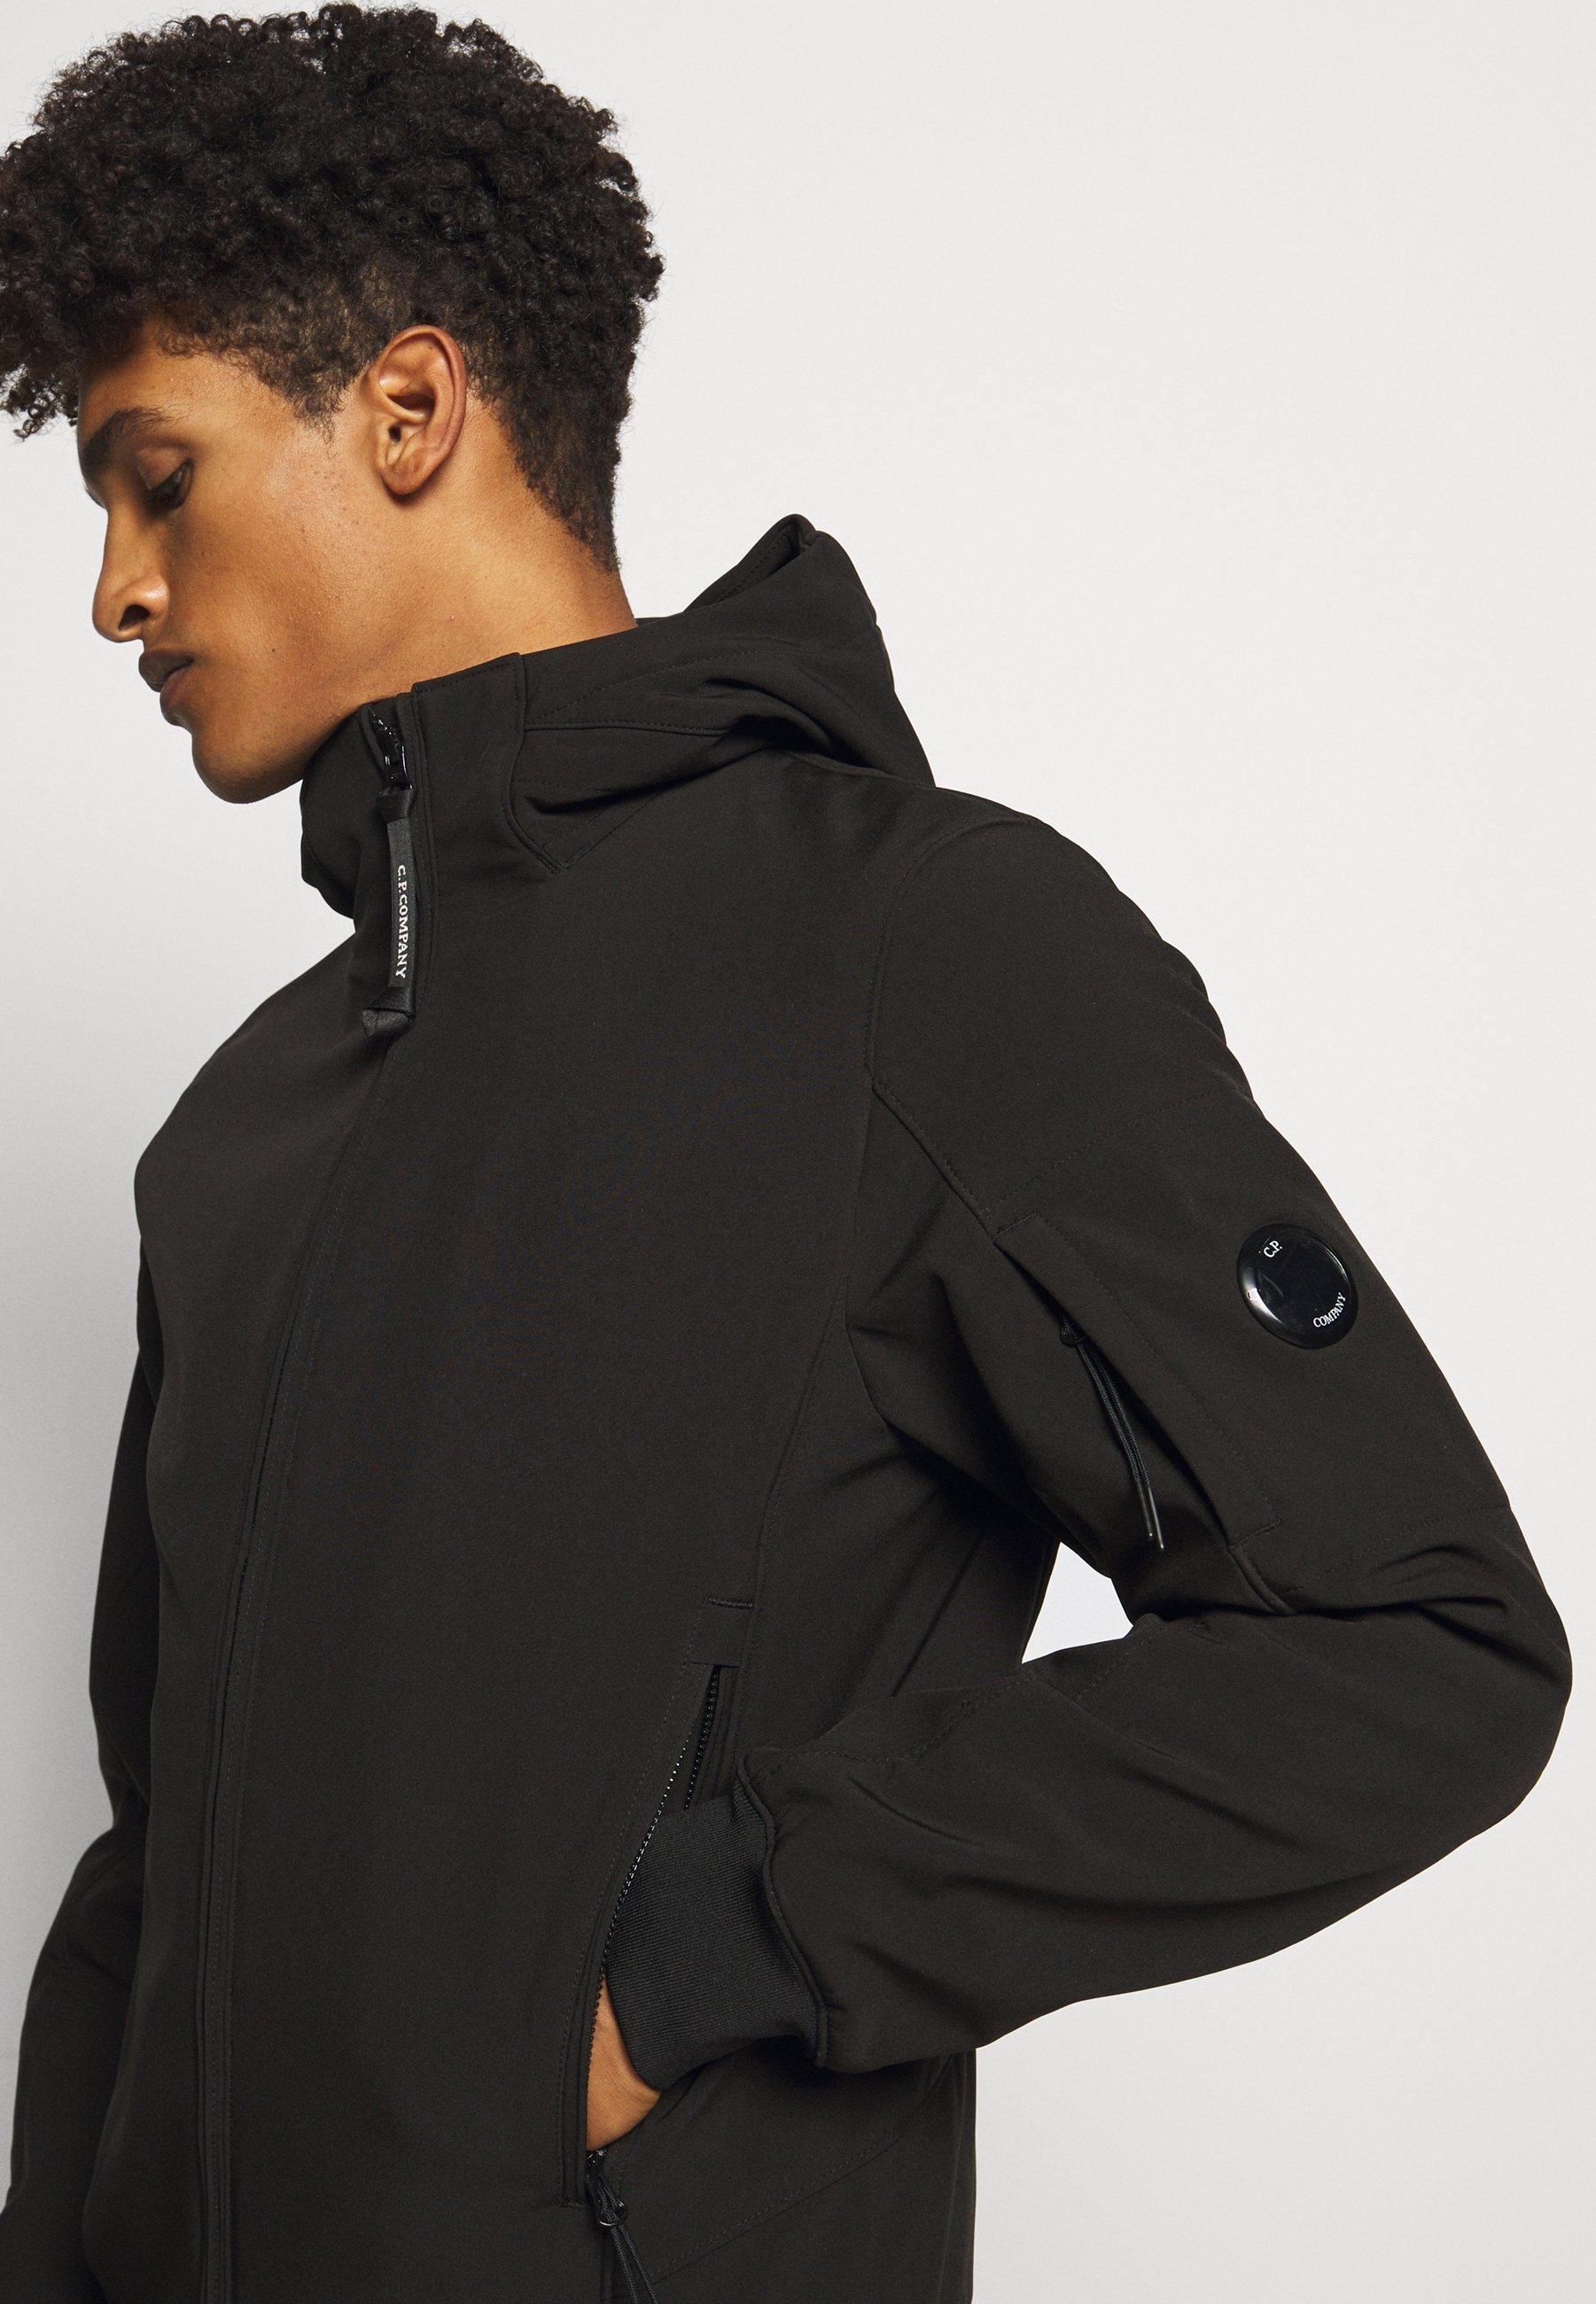 Designer Wholesale C.P. Company OUTERWEAR MEDIUM JACKET - Summer jacket - black | men's clothing 2020 KcPZc